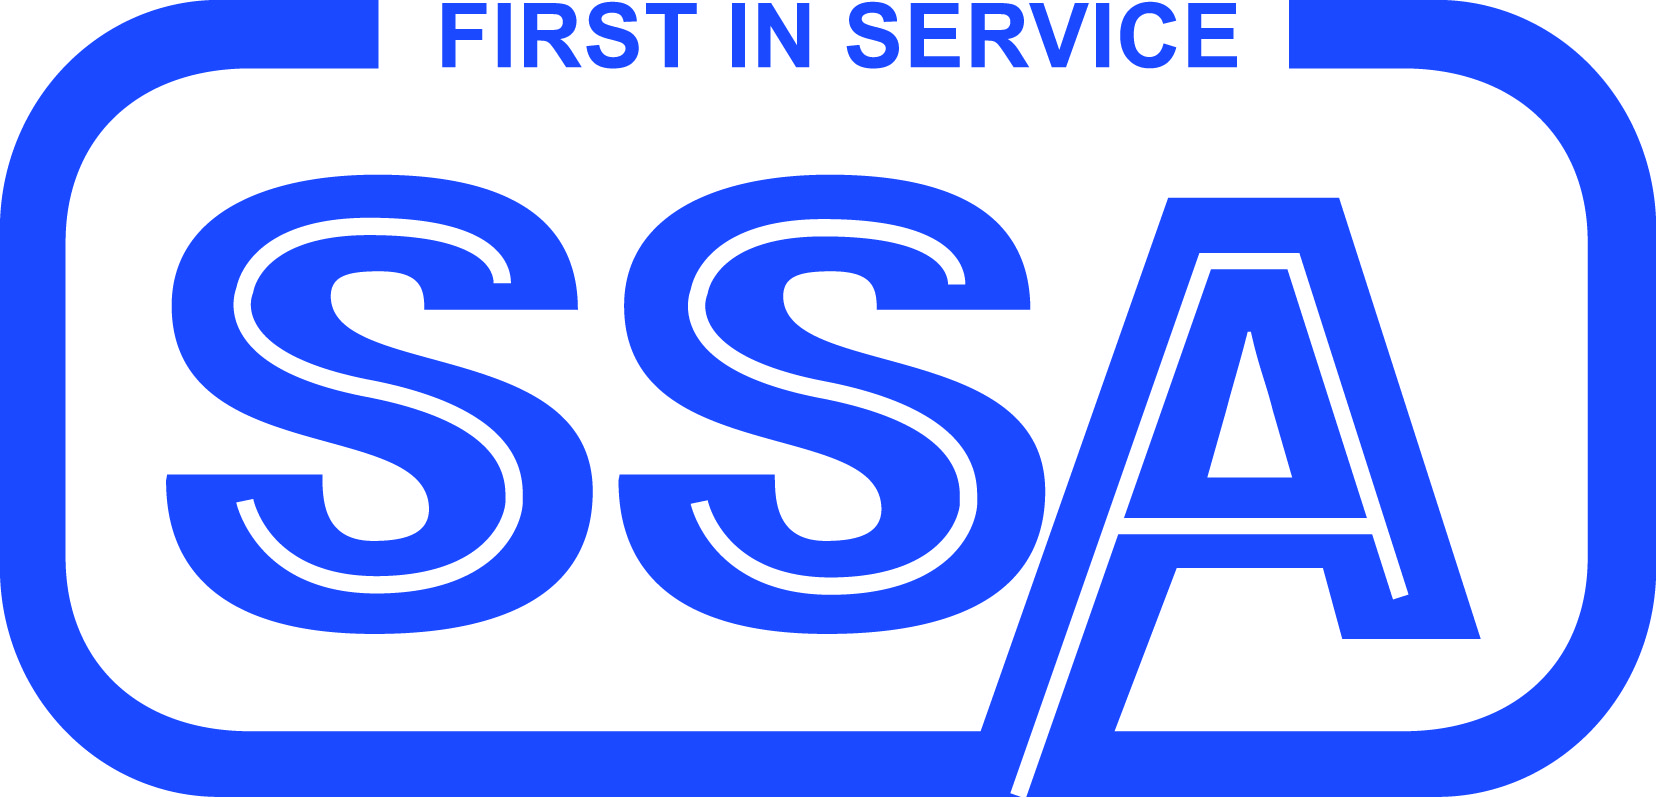 Service Steel Aerospace Corp.